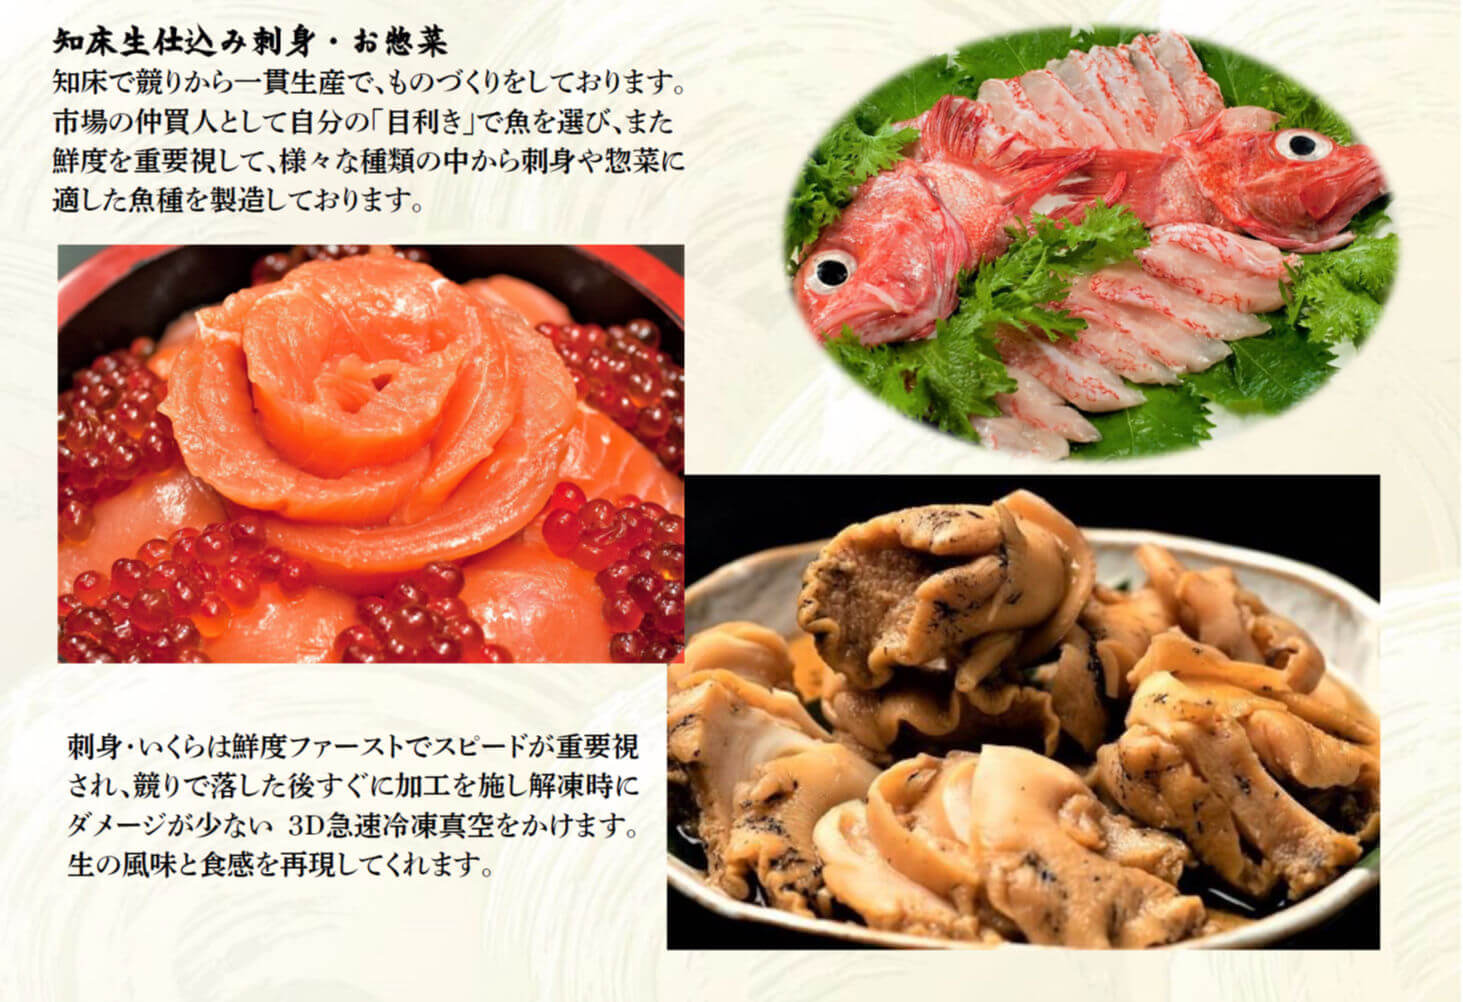 知床生仕込み刺身・お惣菜